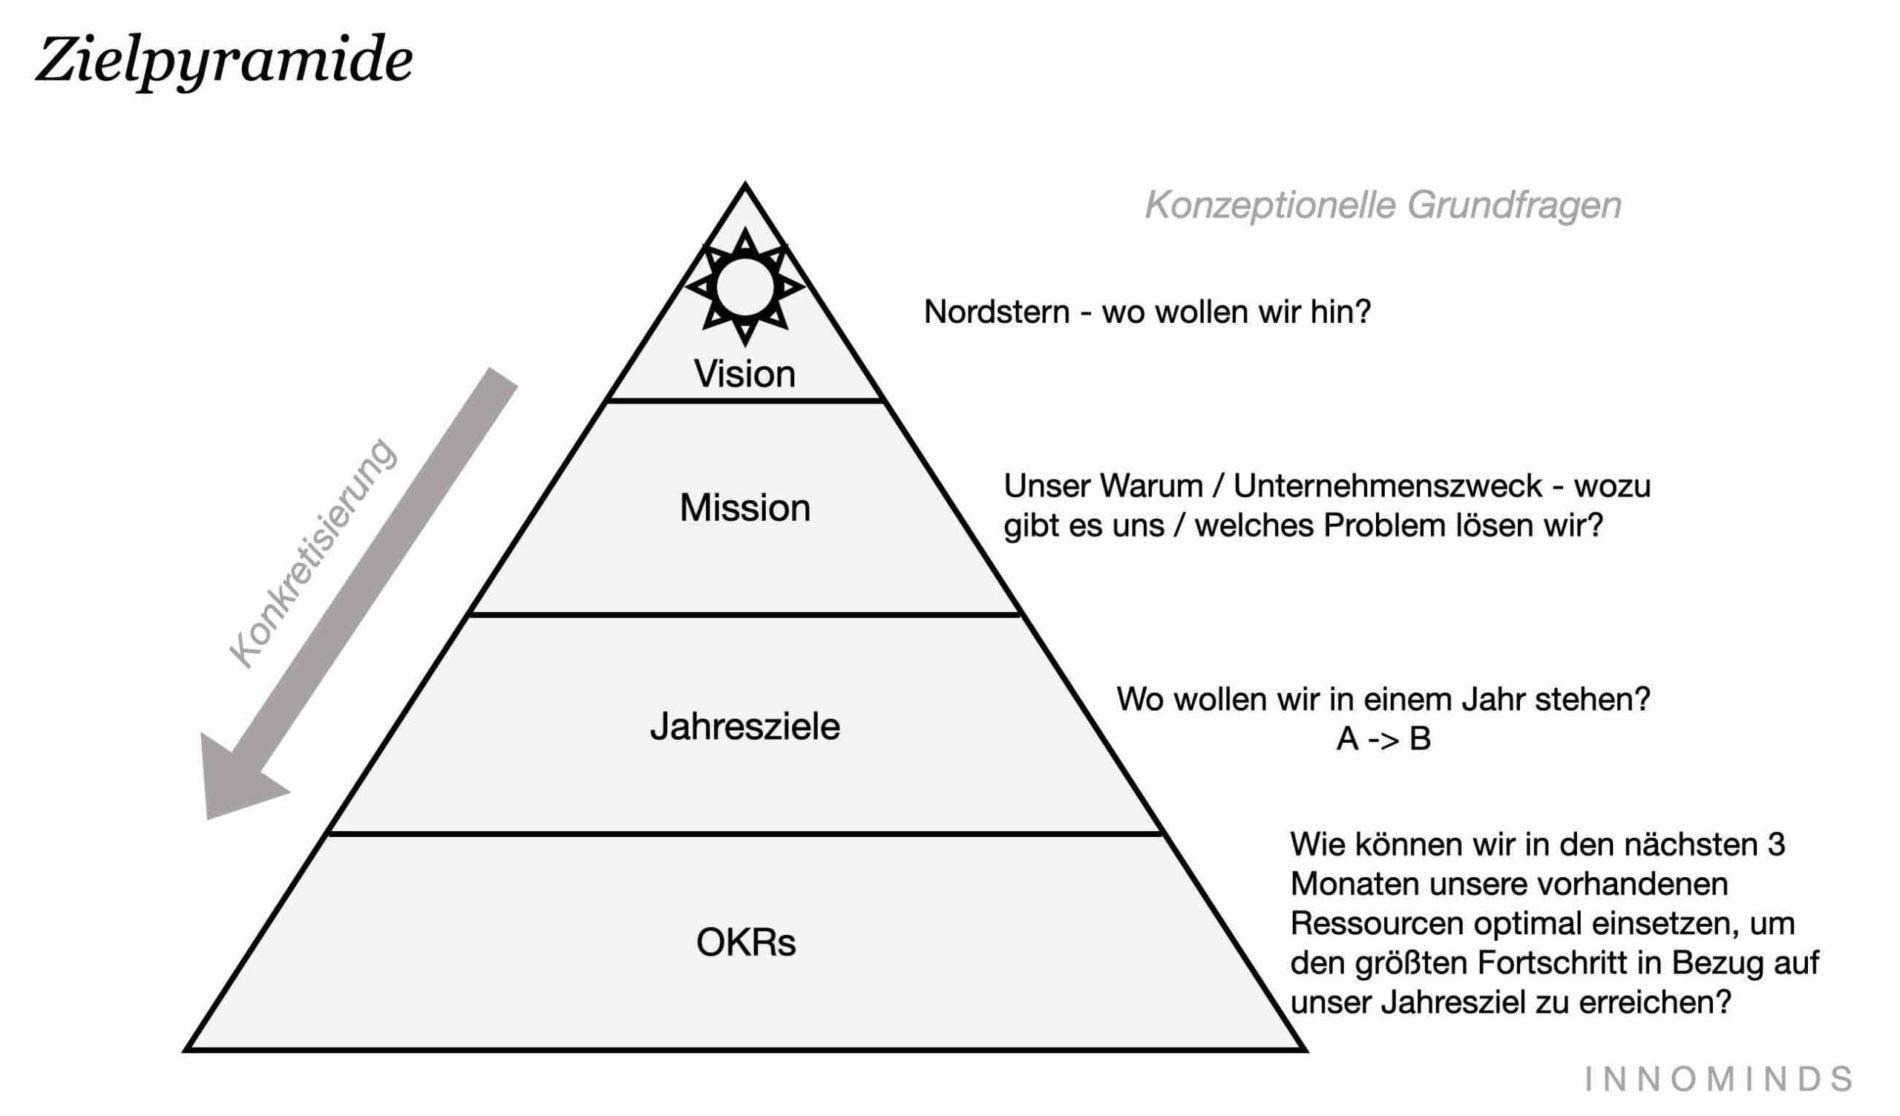 Zielpyramide OKR